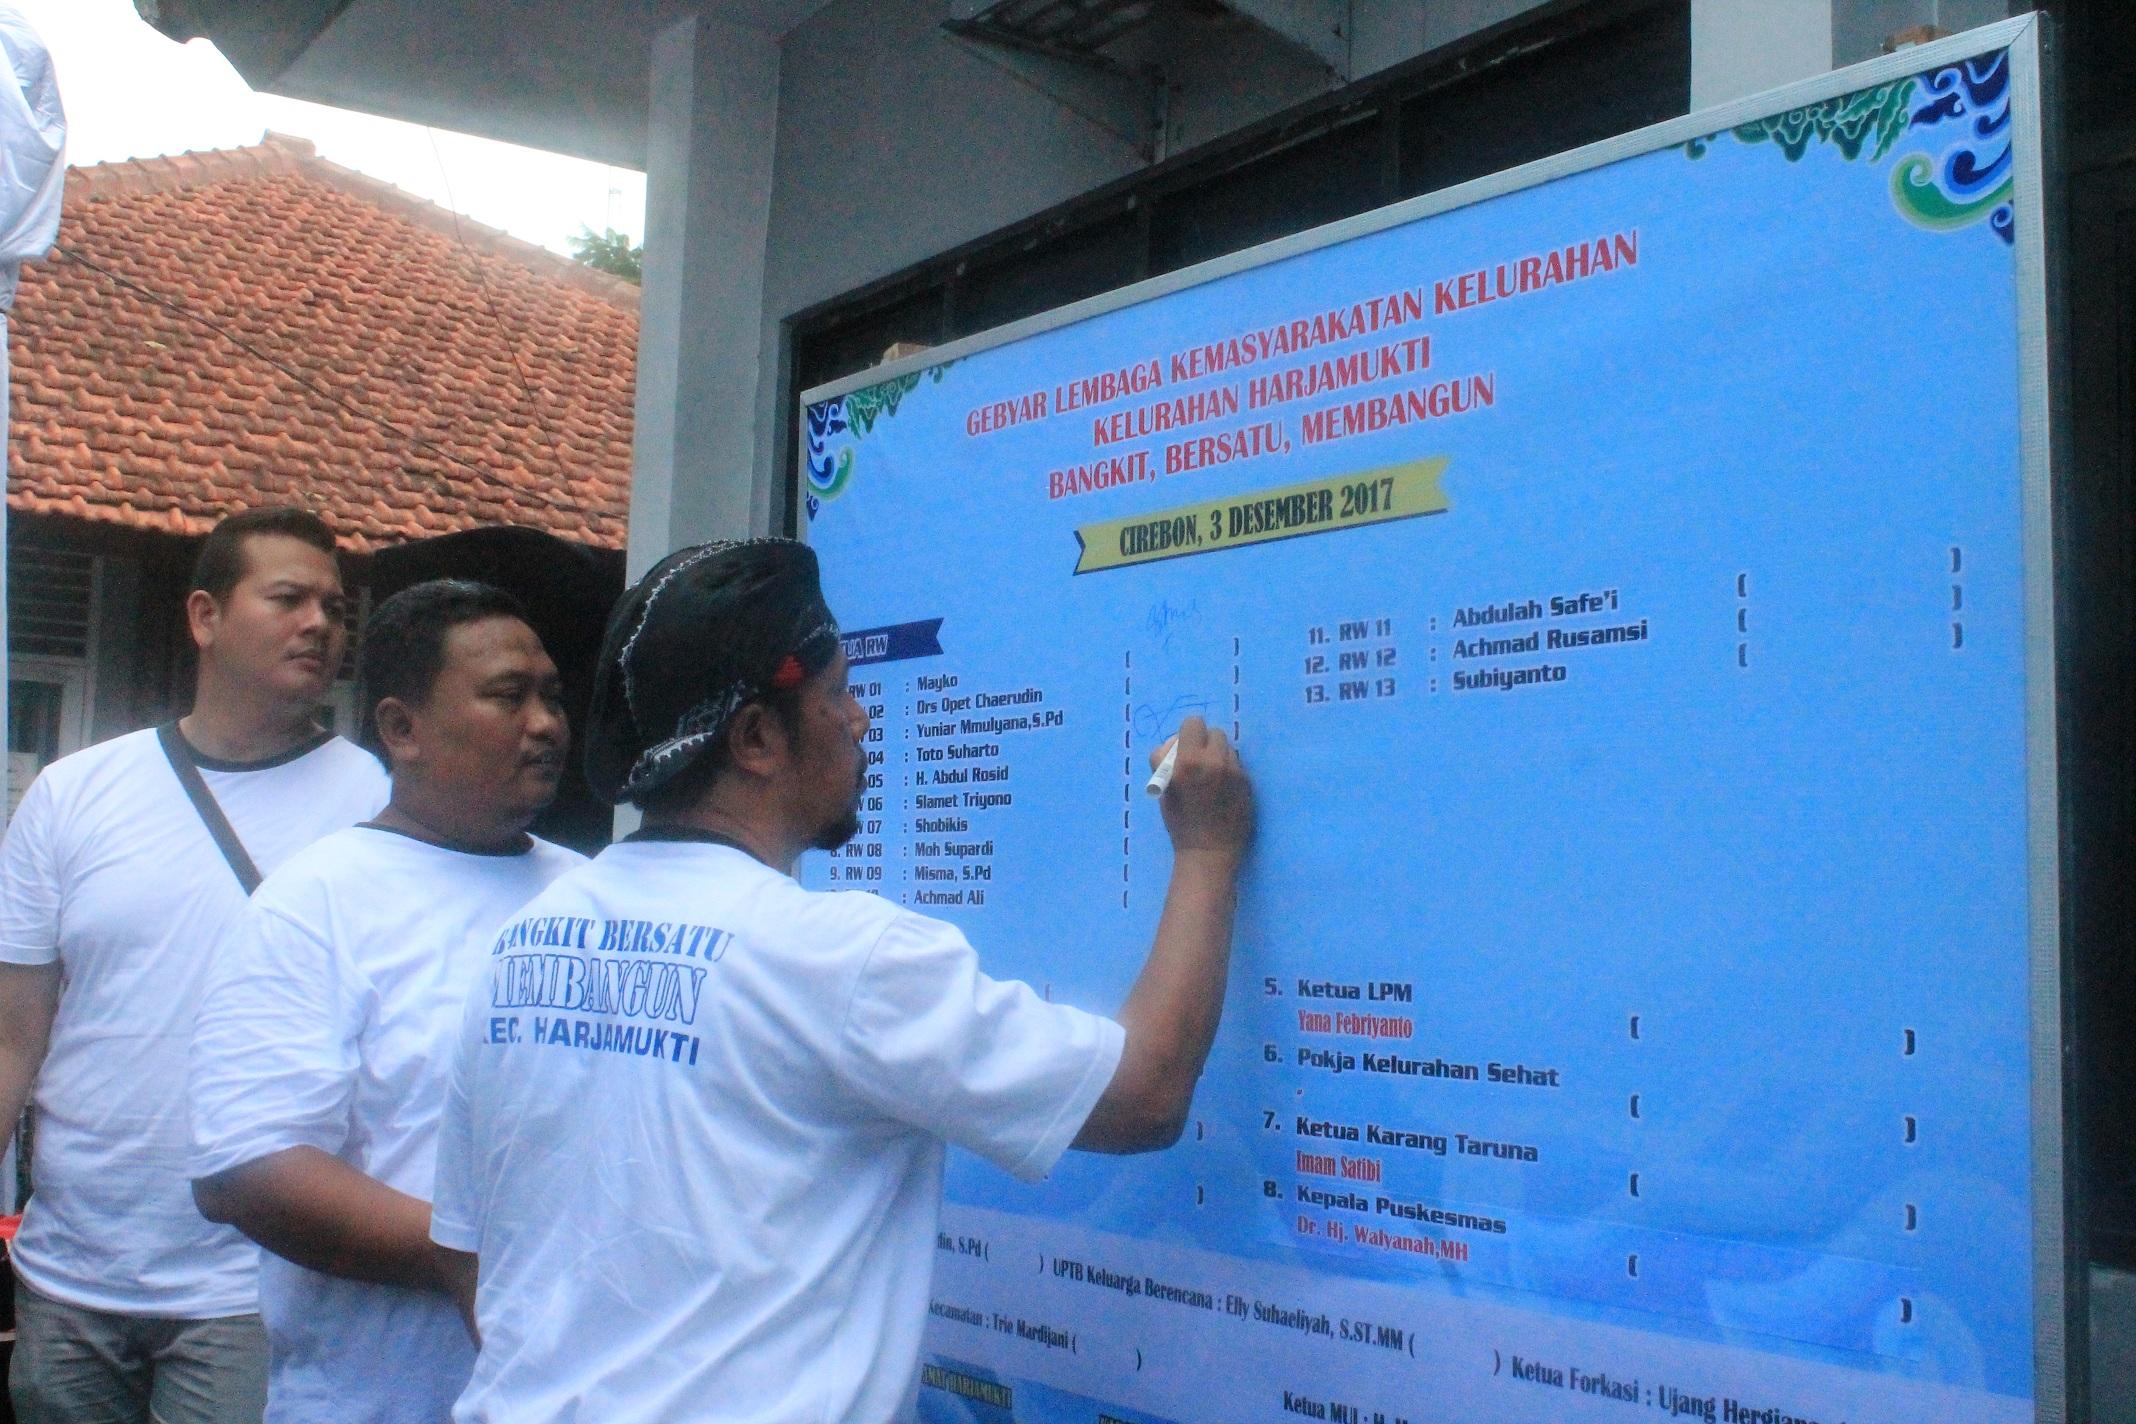 "Komitmen Bersama Dalam Acara Gebyar LKK ""Kecamatan Harjamukti Bangkit Bersatu Membangun"""